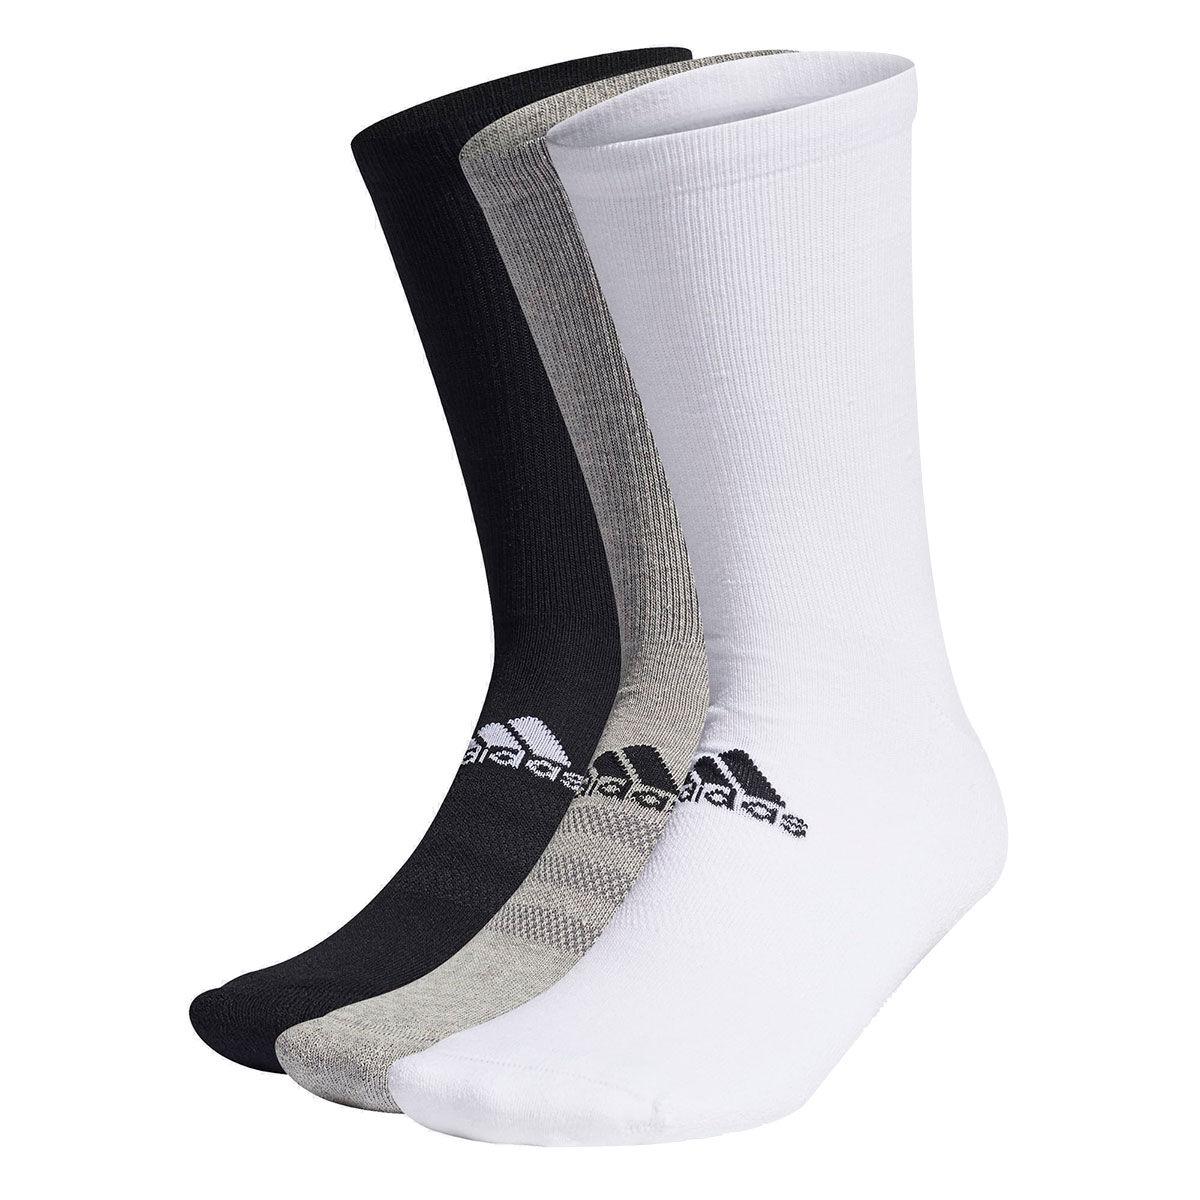 adidas Golf 3 Pack Crew Socks, Mens, White/black/grey, 6.5-8 | American Golf